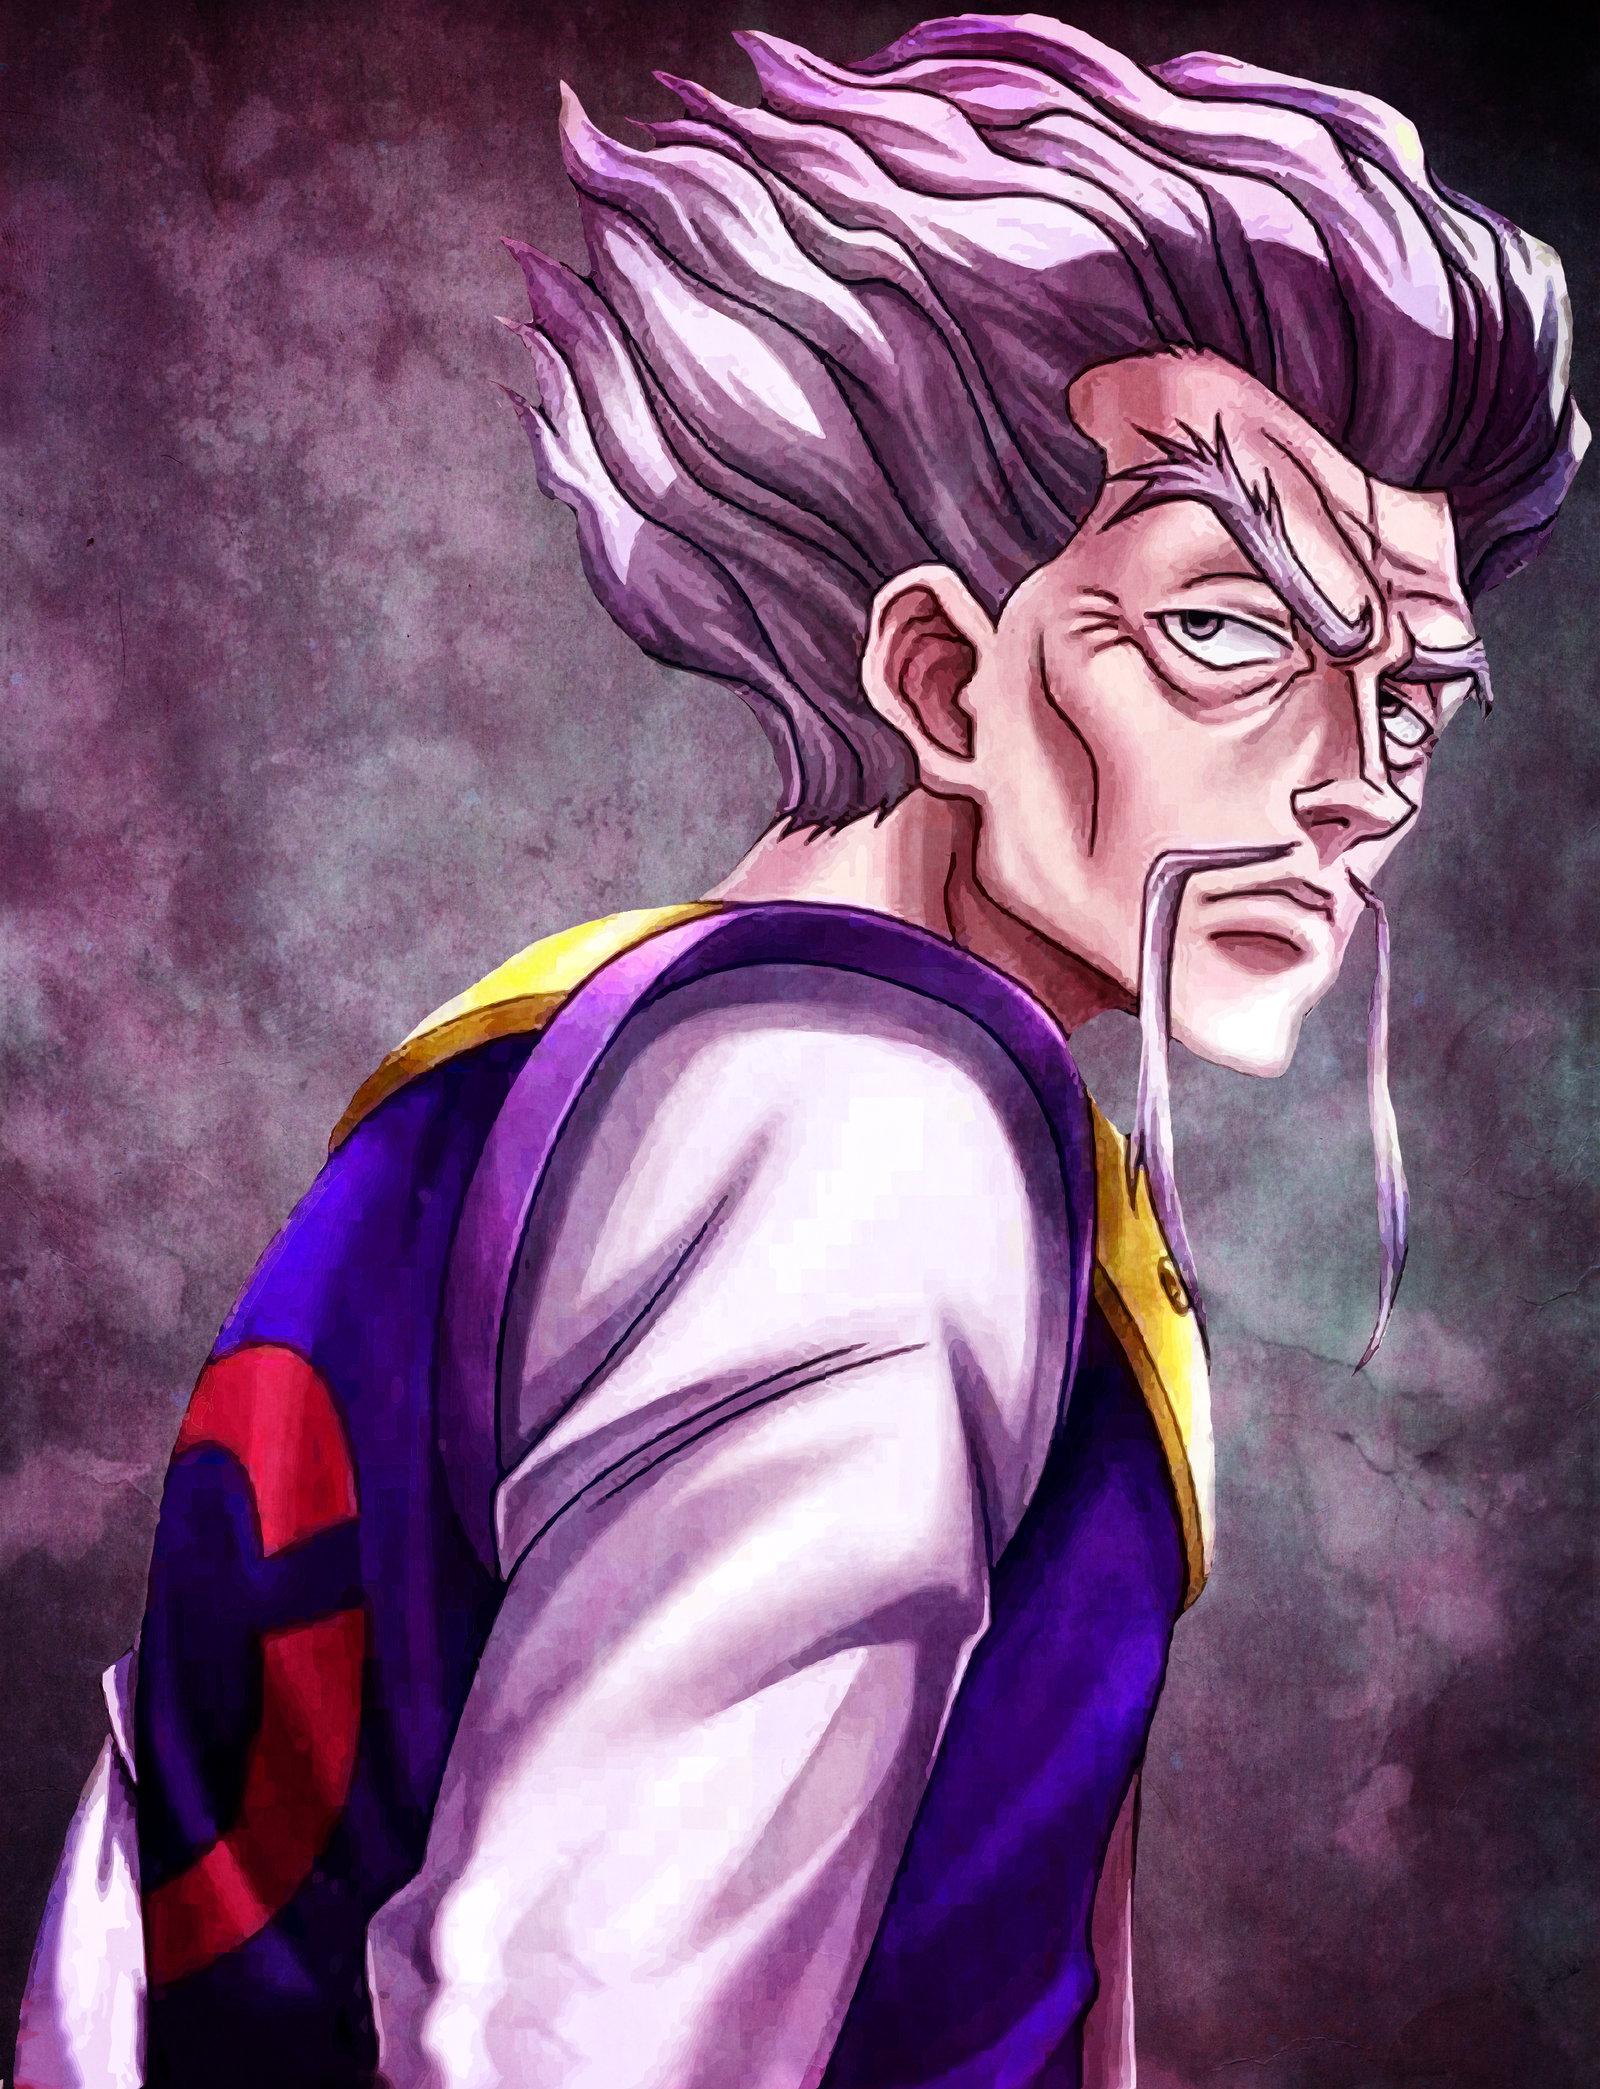 Anime 1600x2089 Hunter x Hunter Zeno Zoldyck anime anime men